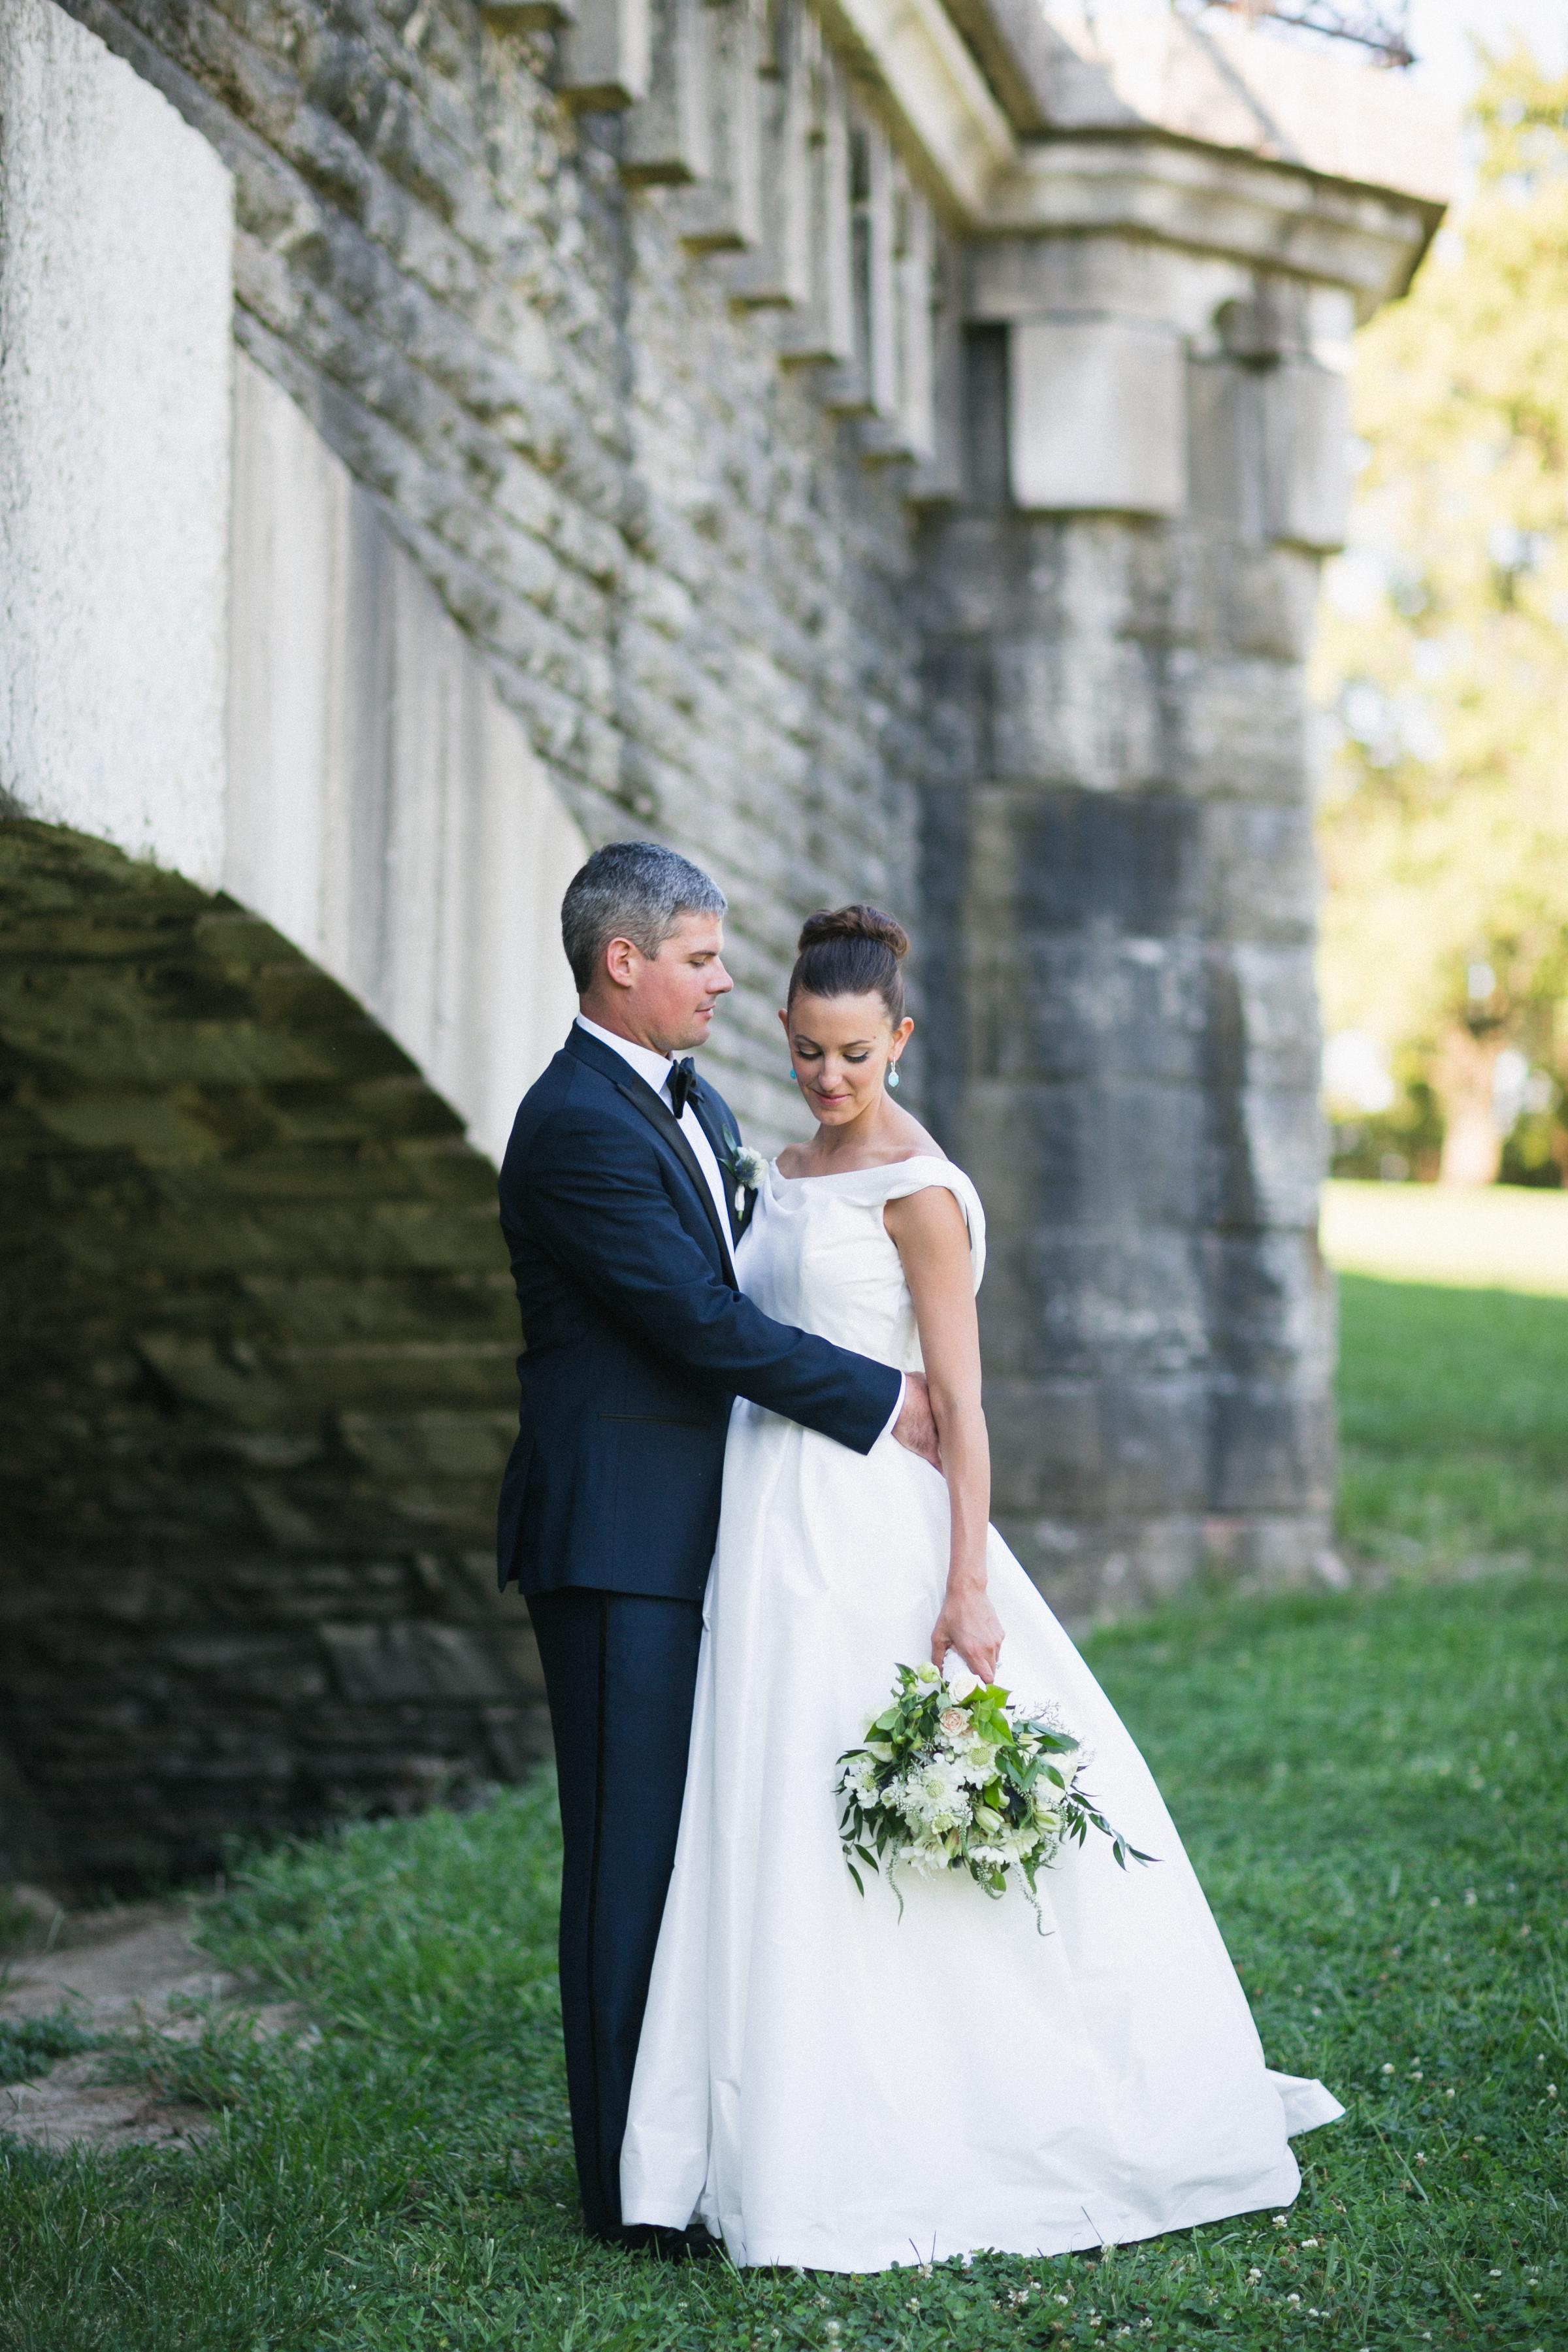 Courtenay Lambert Florals and Event Design Wedding Monastery Event Center Cincinnati OH, Robin McKerrell Photography, i-do Weddings & Events